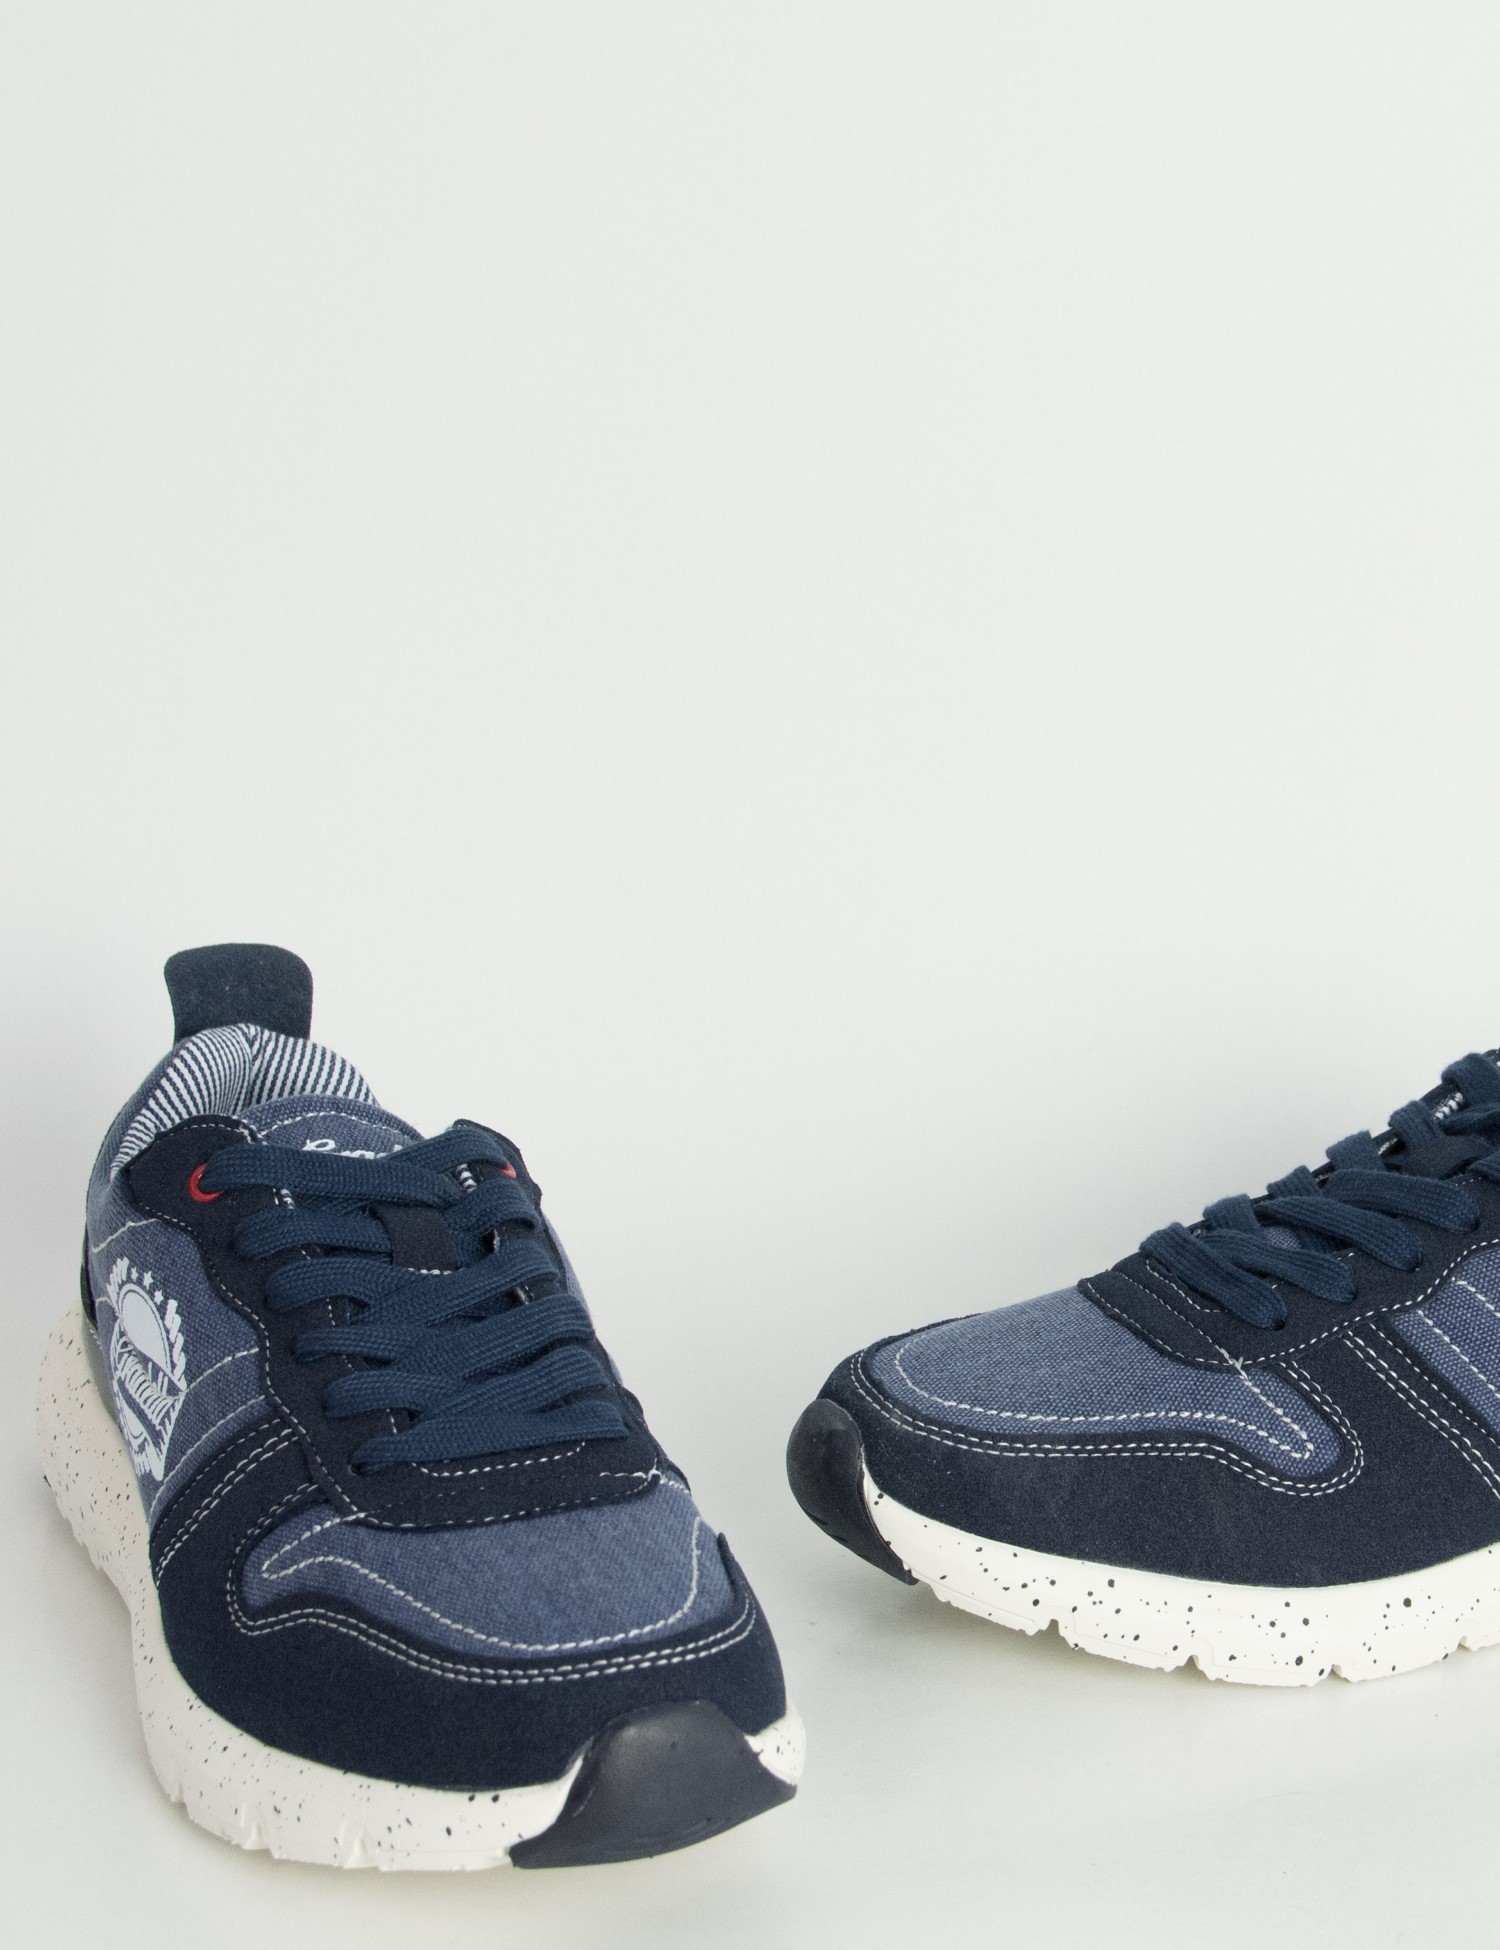 2b624284615 Ανδρικά Sneakers παπούτσια μπλε υφασμάτινα K70420C